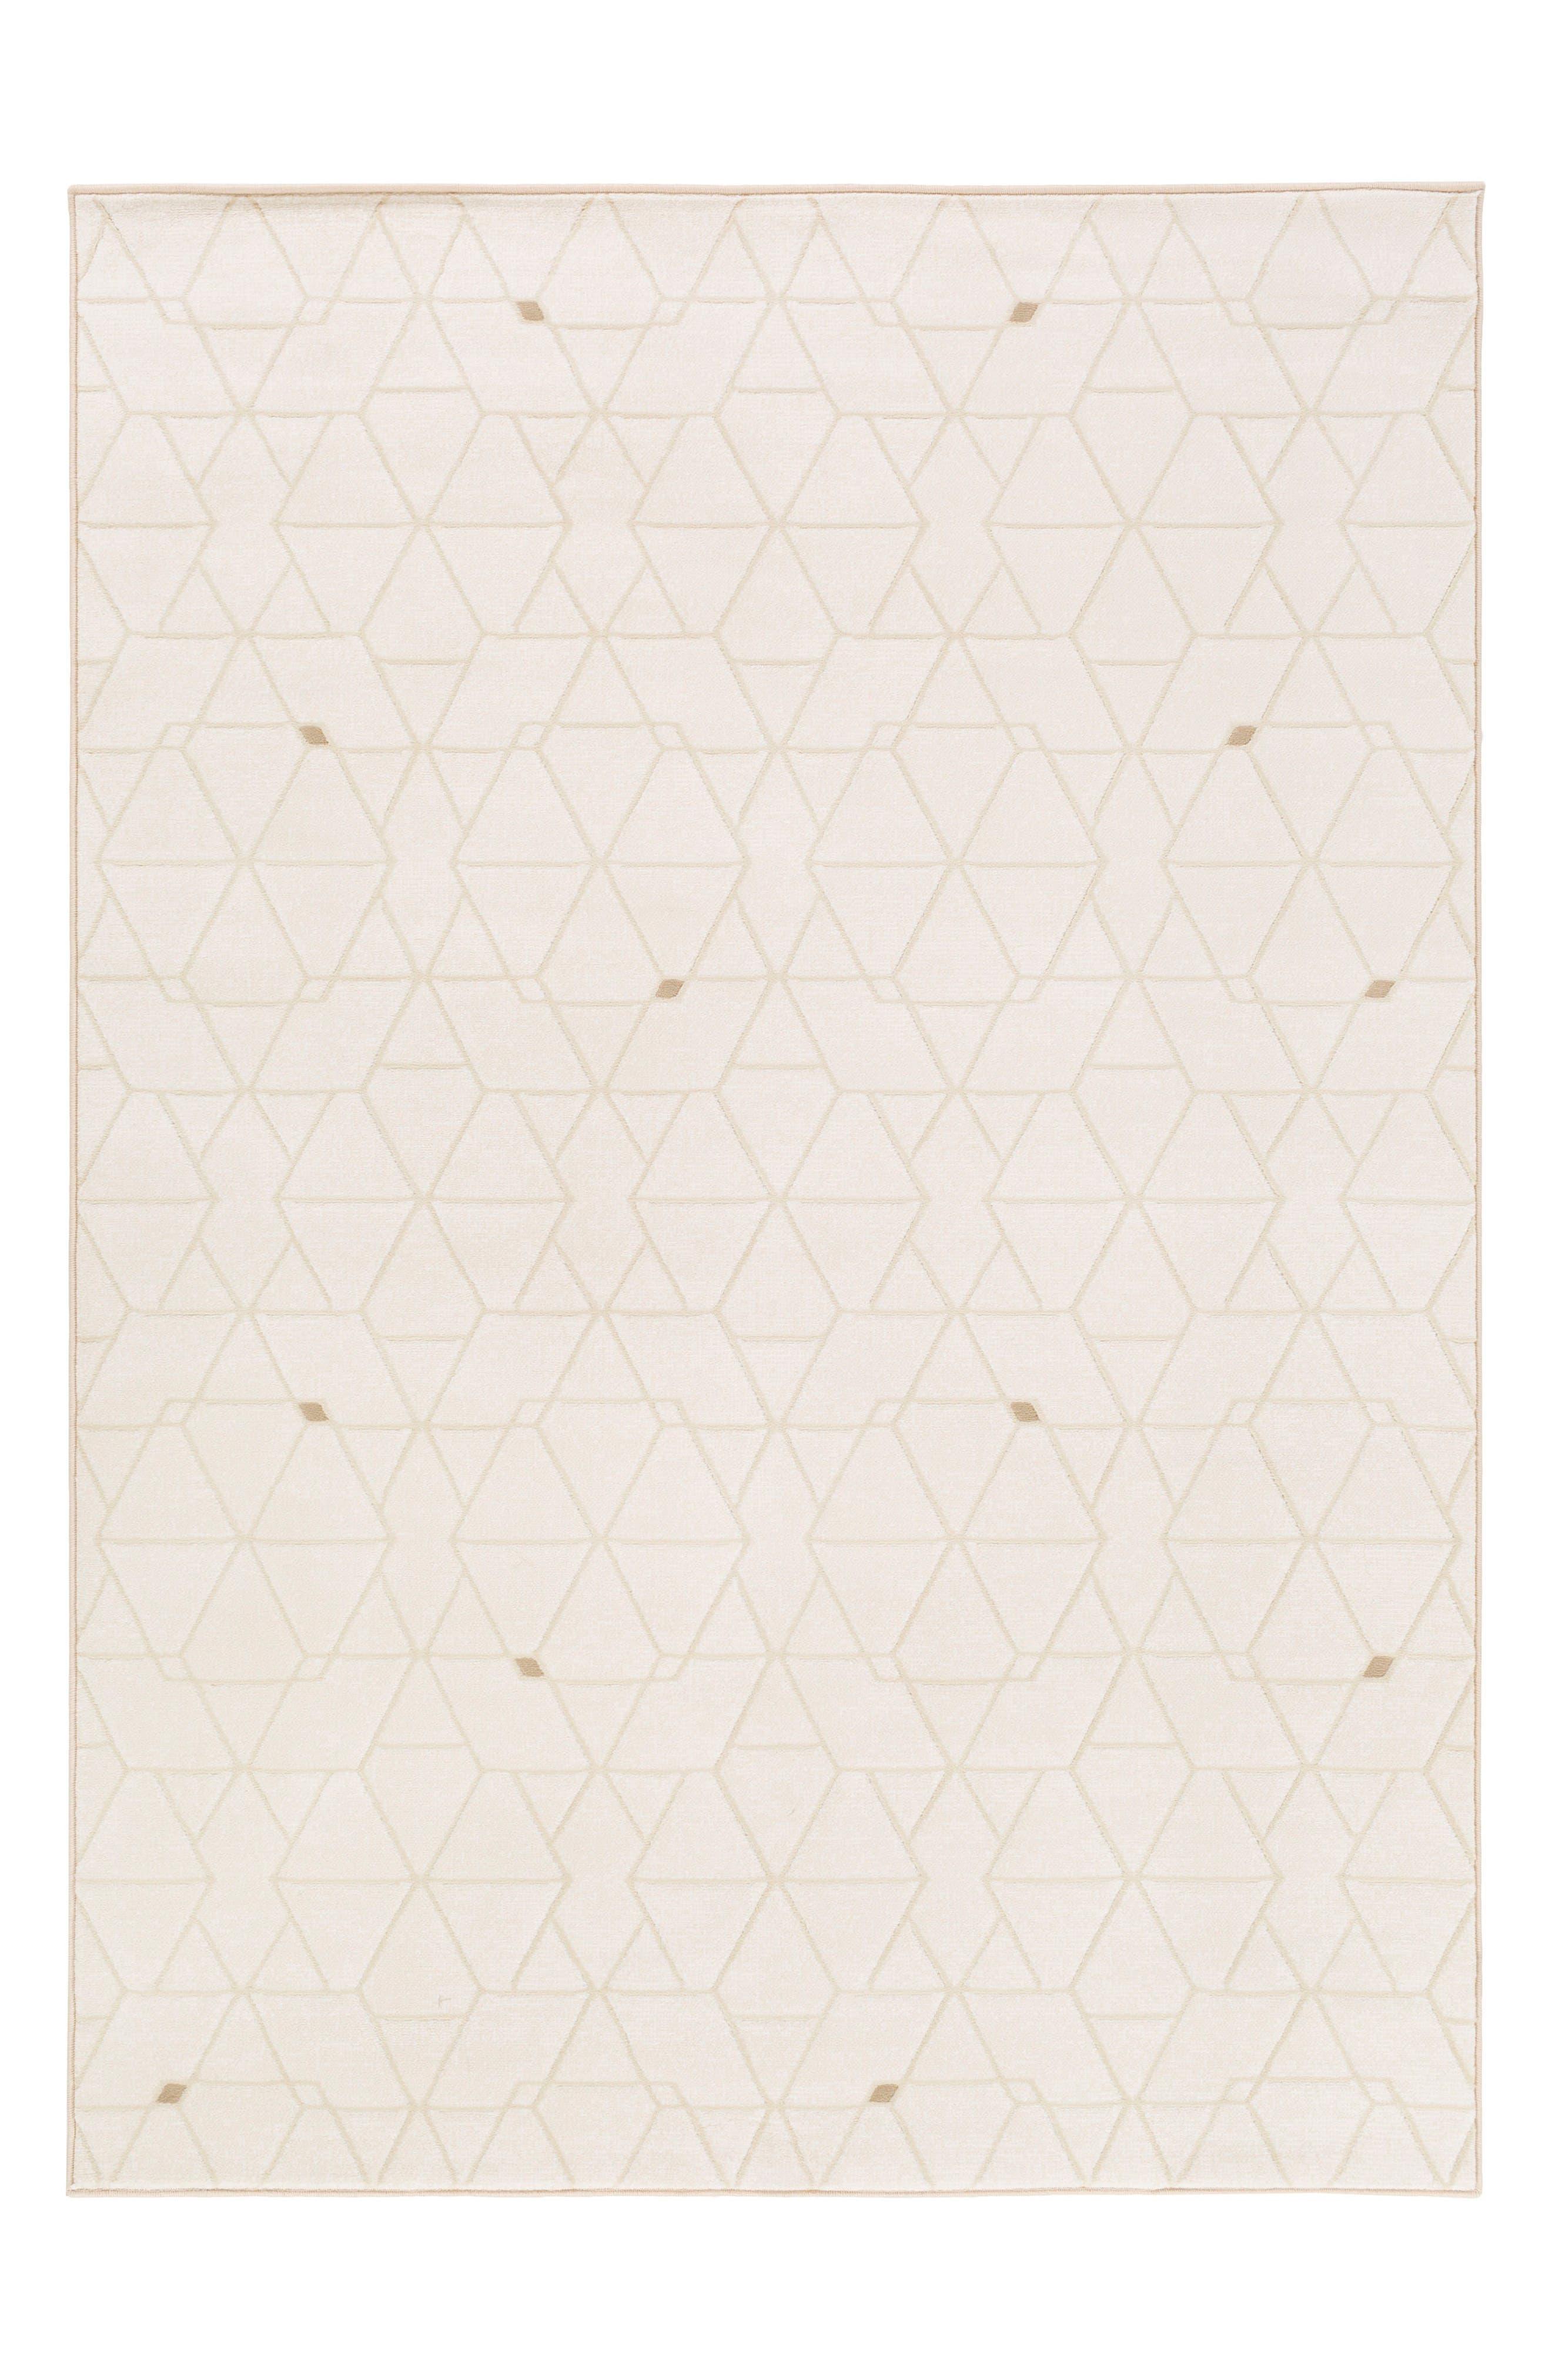 Geometric Rug,                         Main,                         color, White